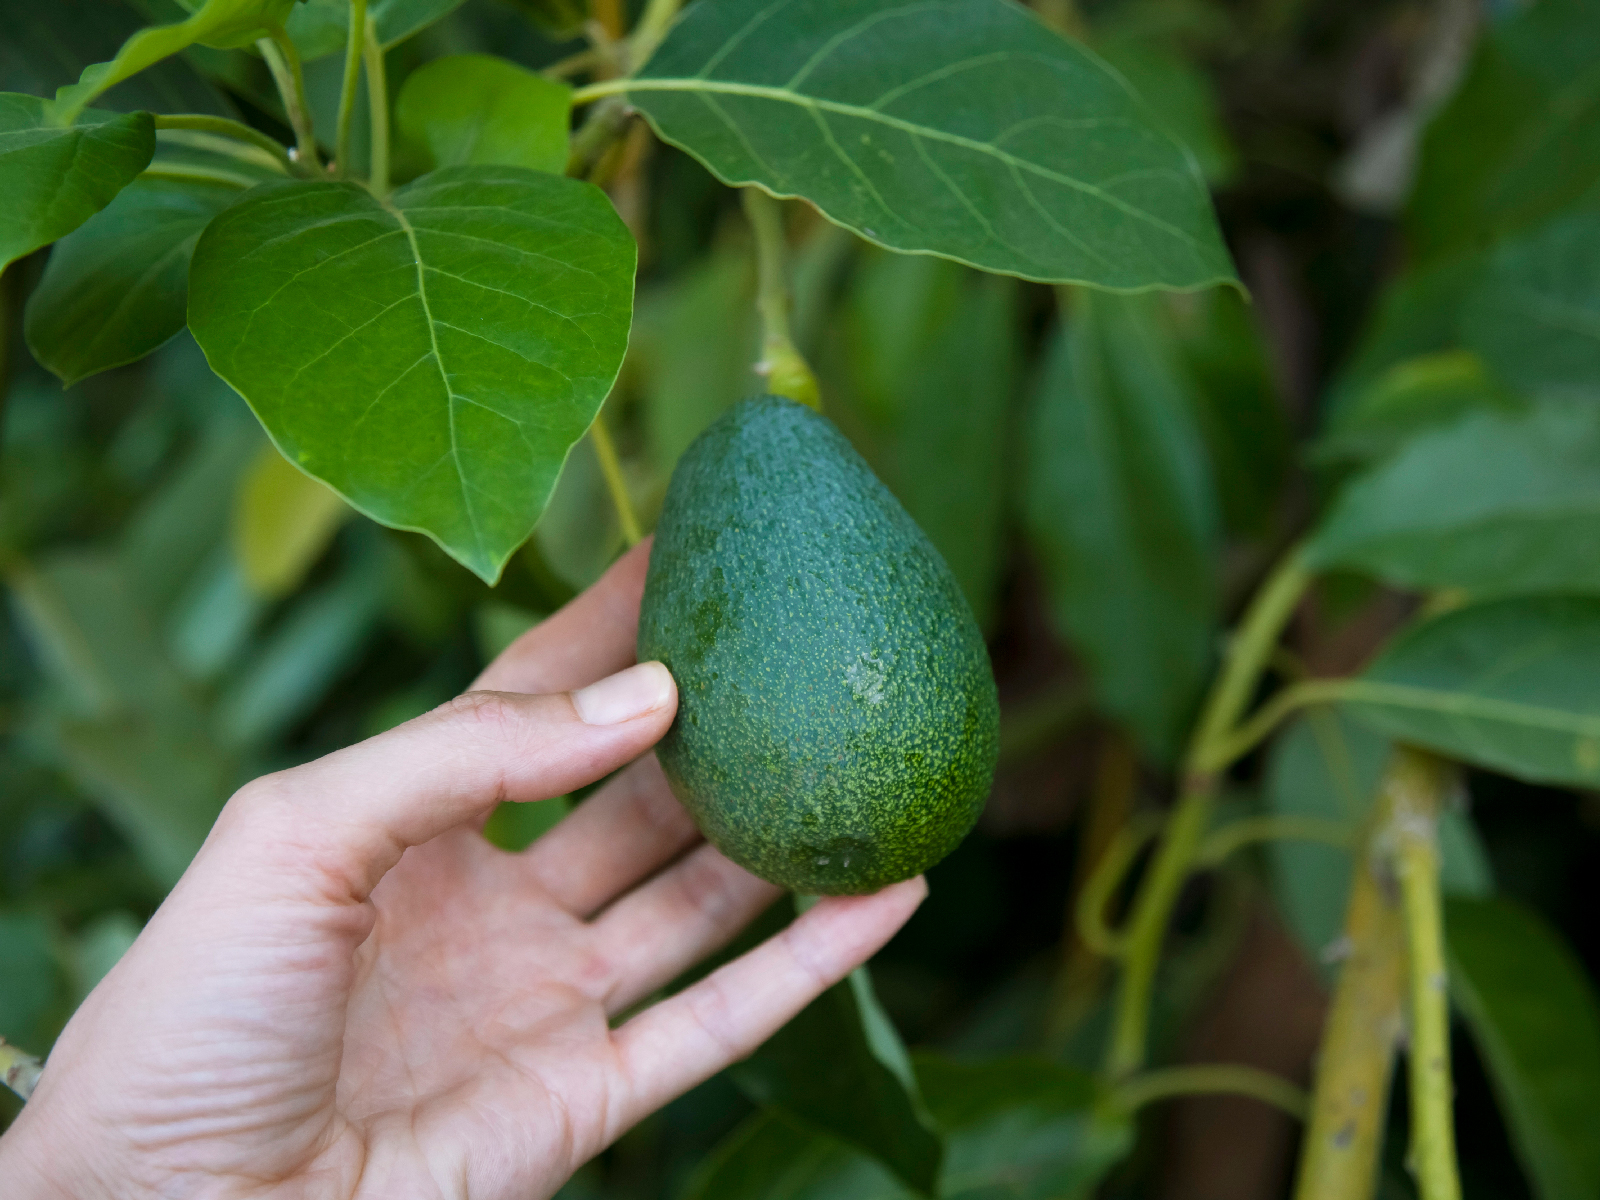 This Avocado Oil Company Is Giving Away an Entire Avocado Grove